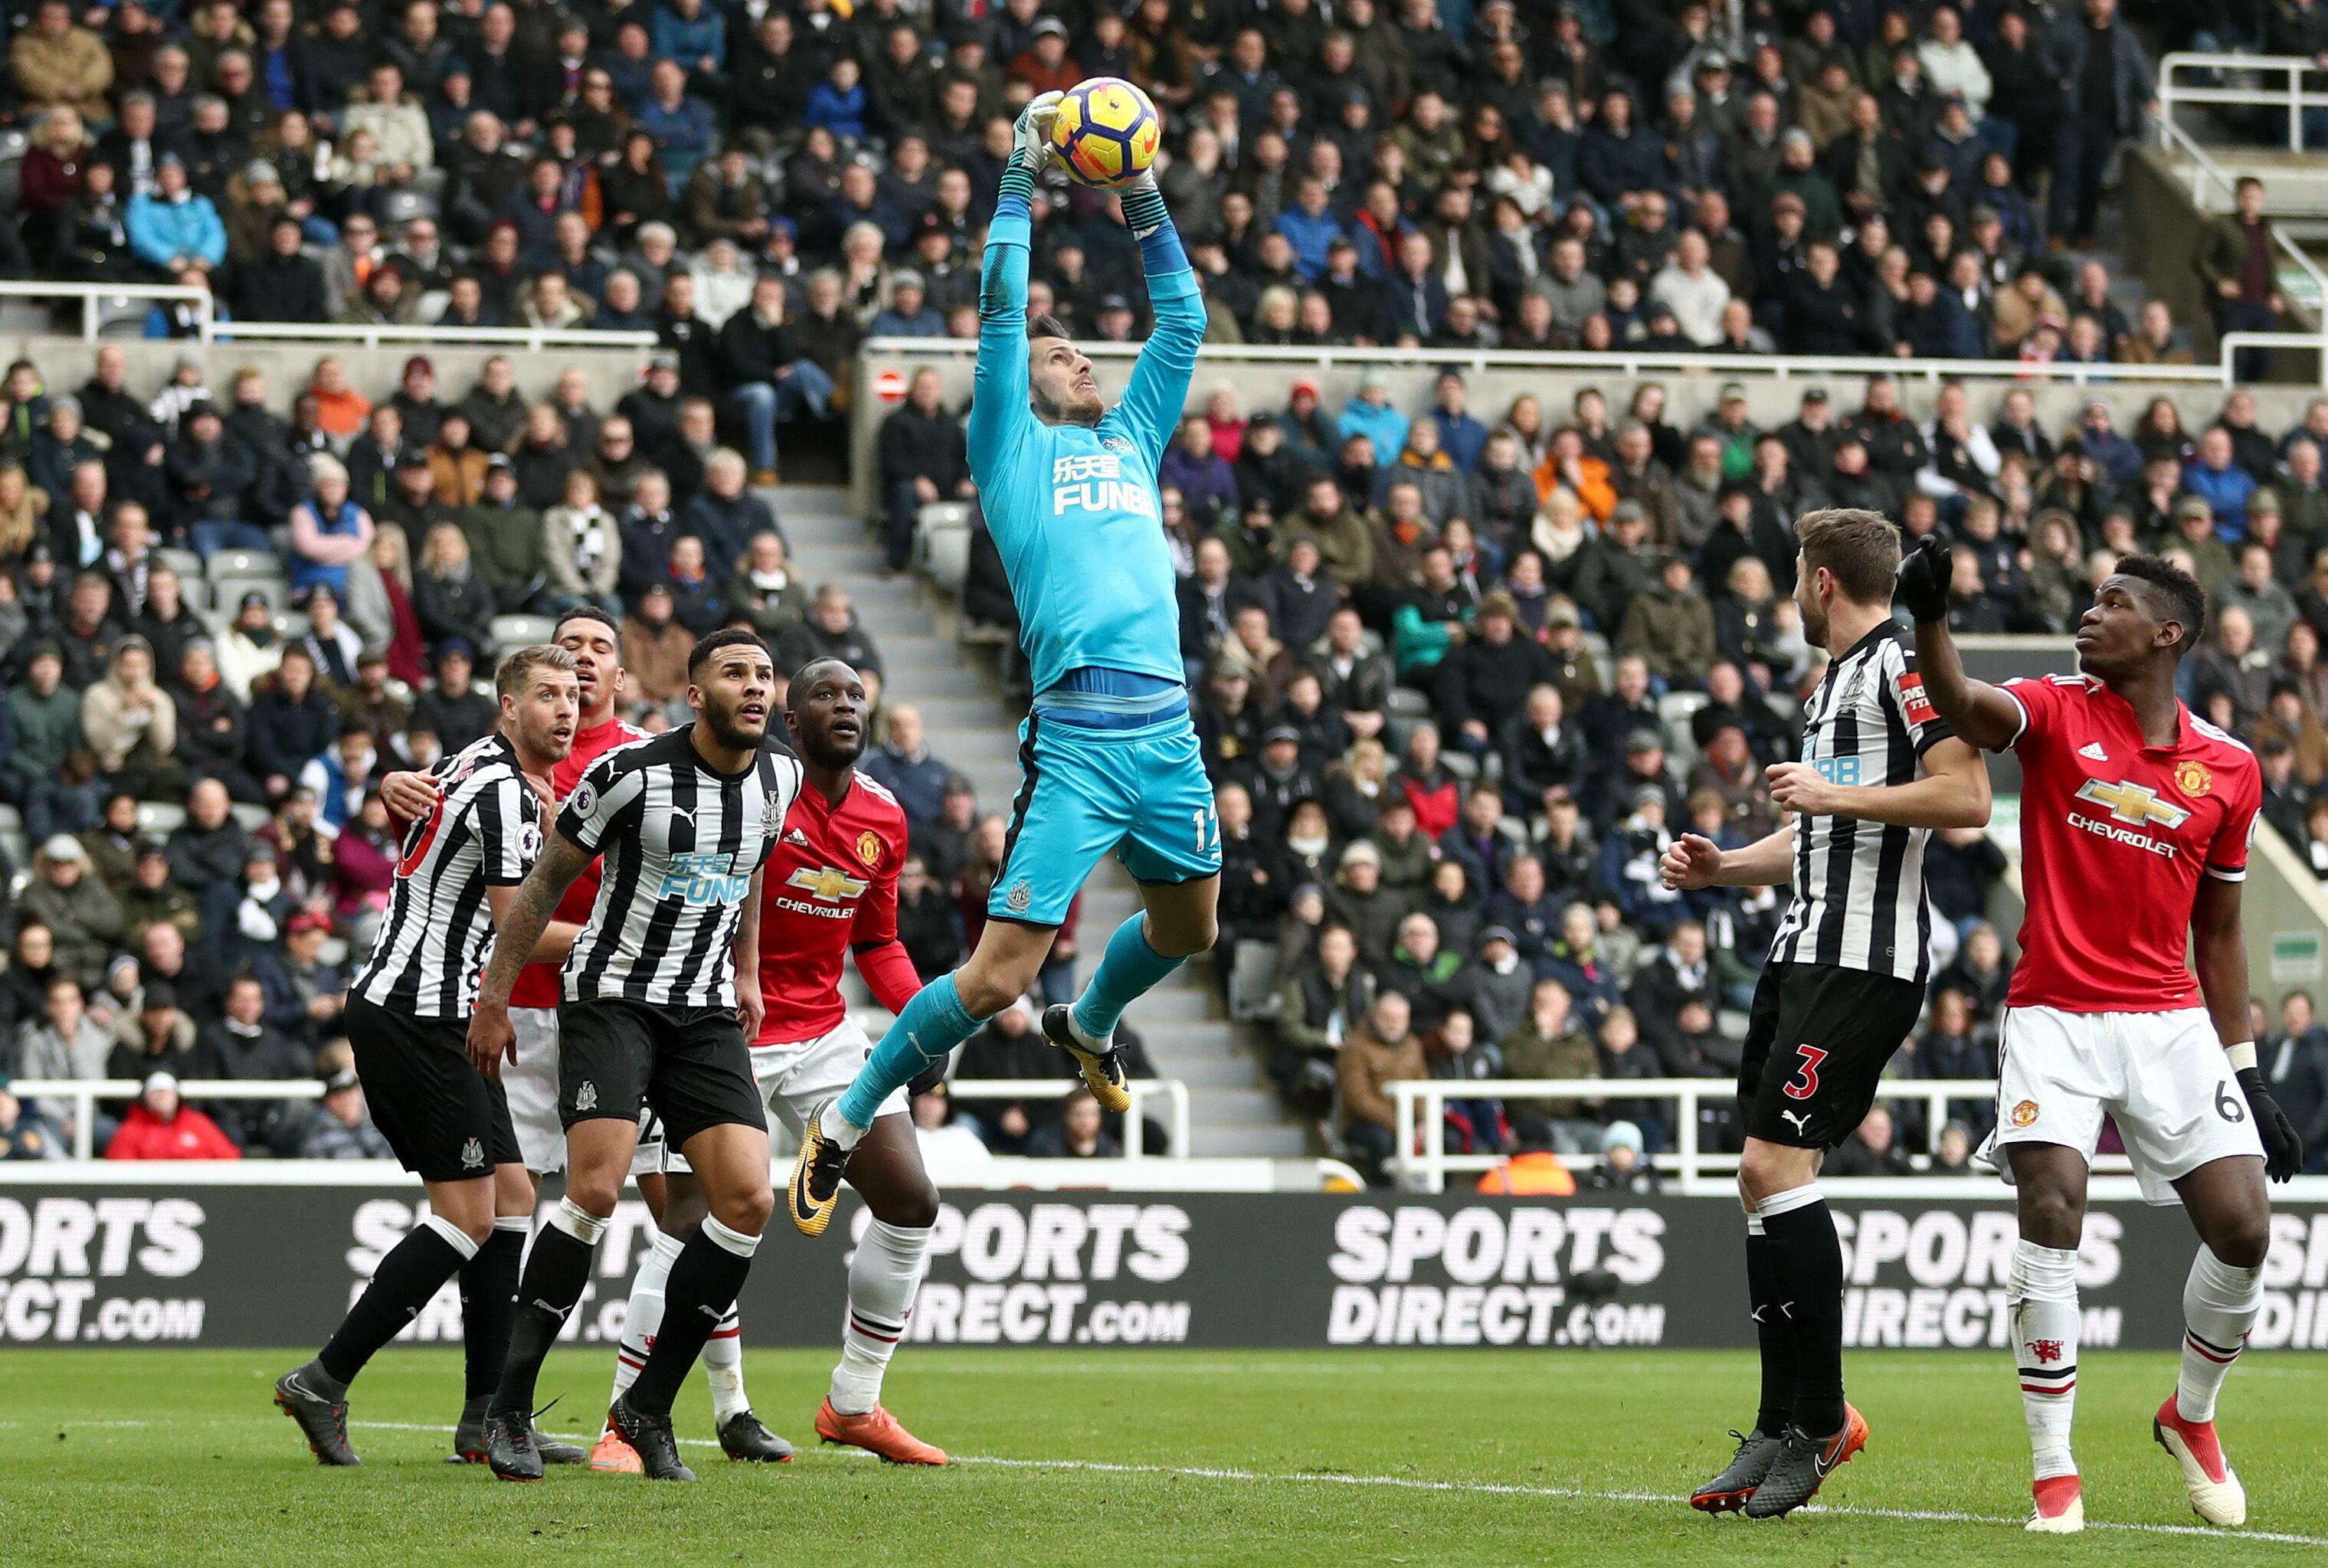 Newcastle United: Martin Dubravka's Performance On Sunday For Newcastle